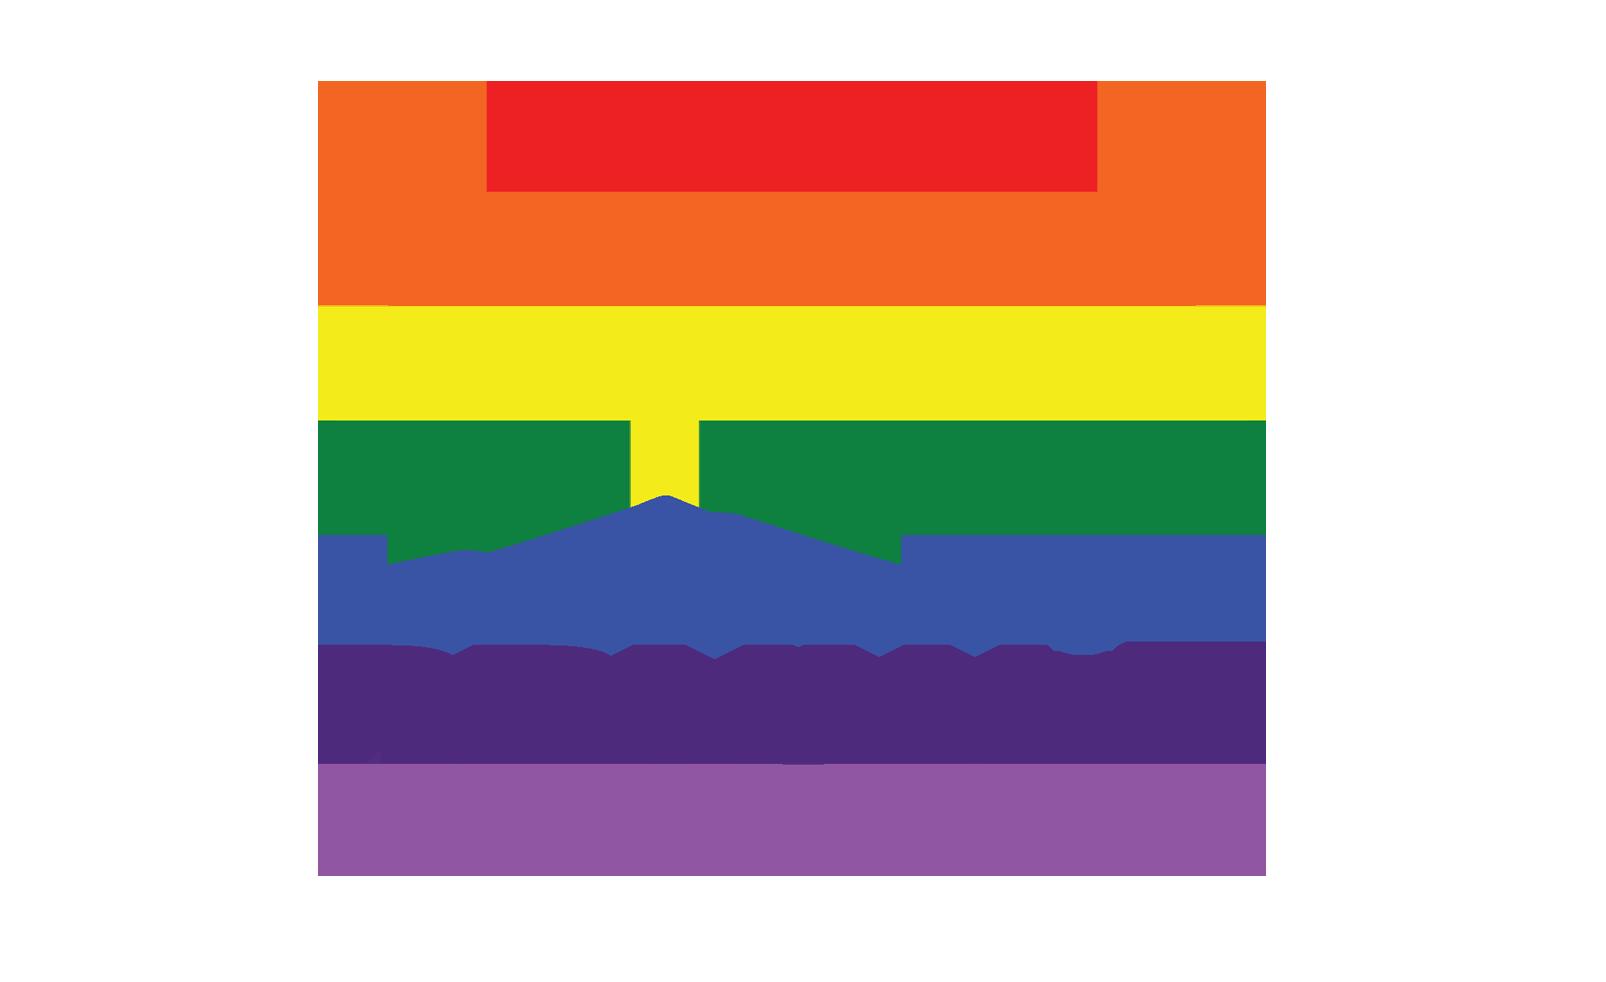 PDXWIT-Logos-Variants-Pride.png